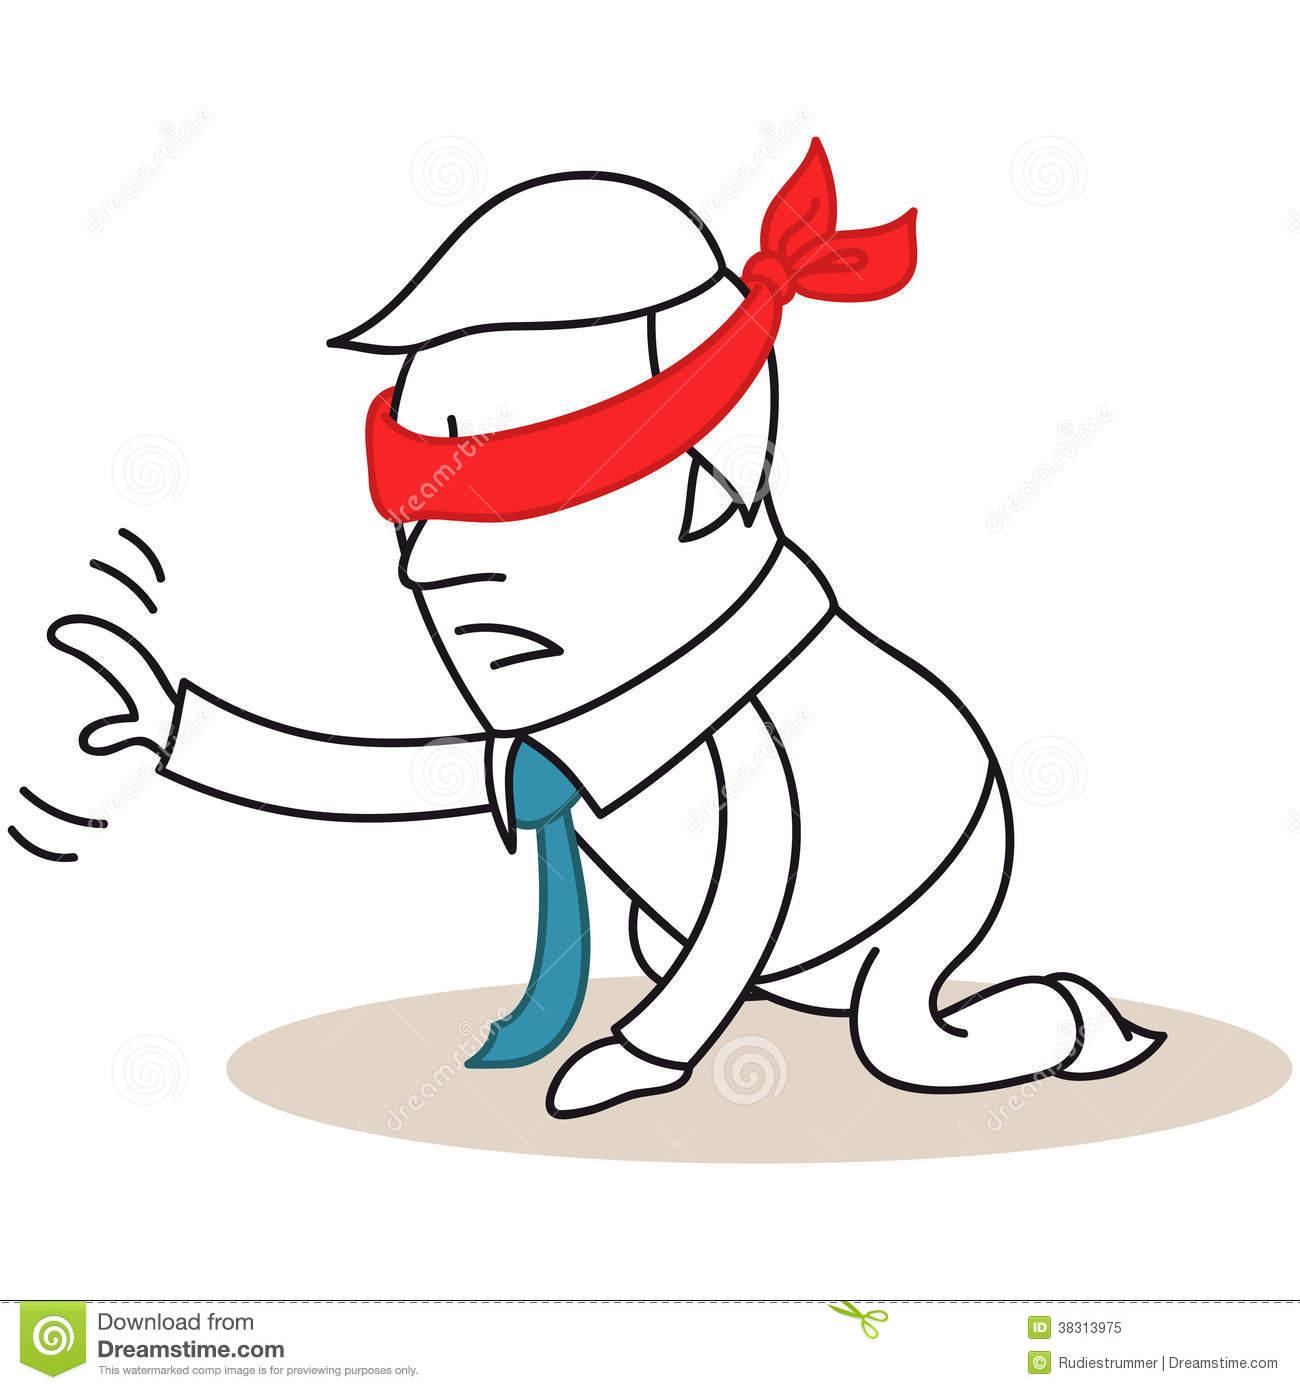 Blindfolded Stock Illustrations.